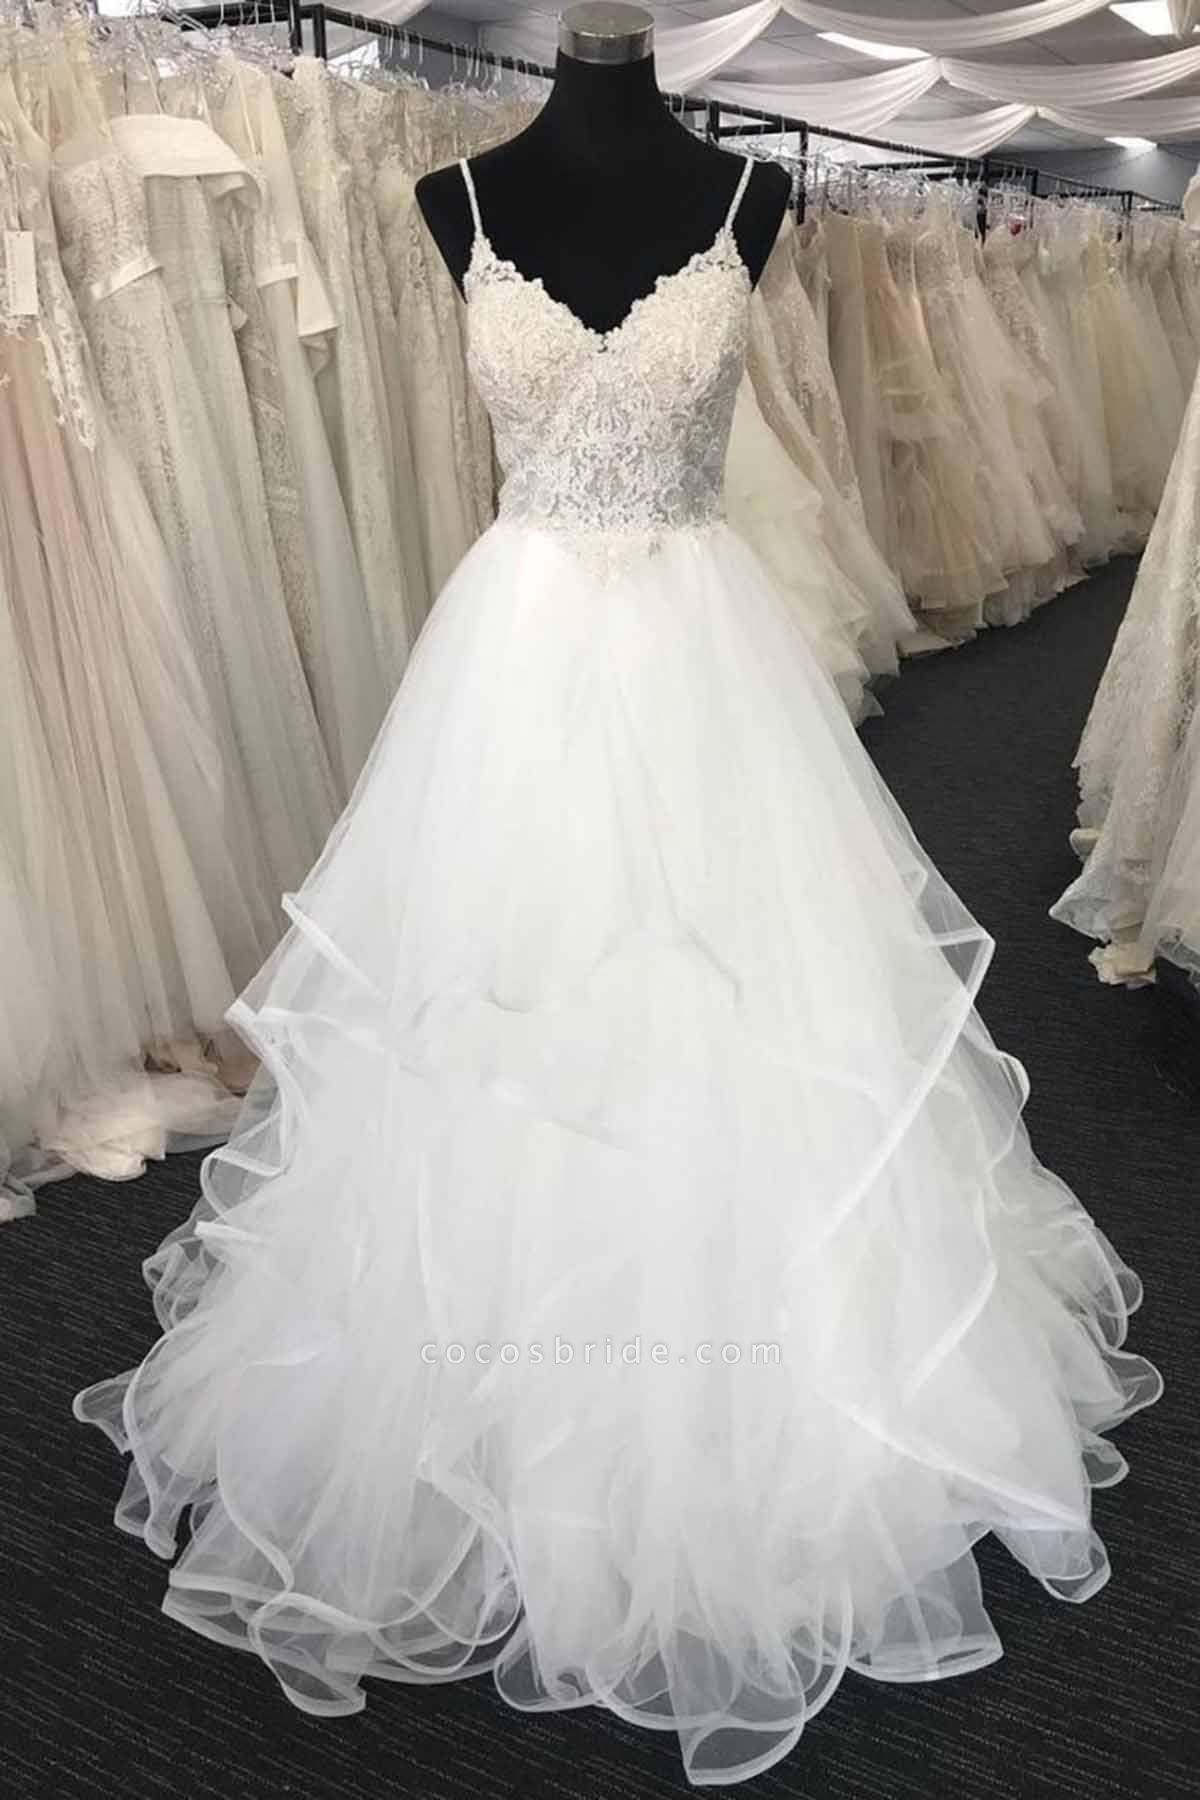 Sweetheart Neck Long Spaghetti Straps White Lace Wedding Dress